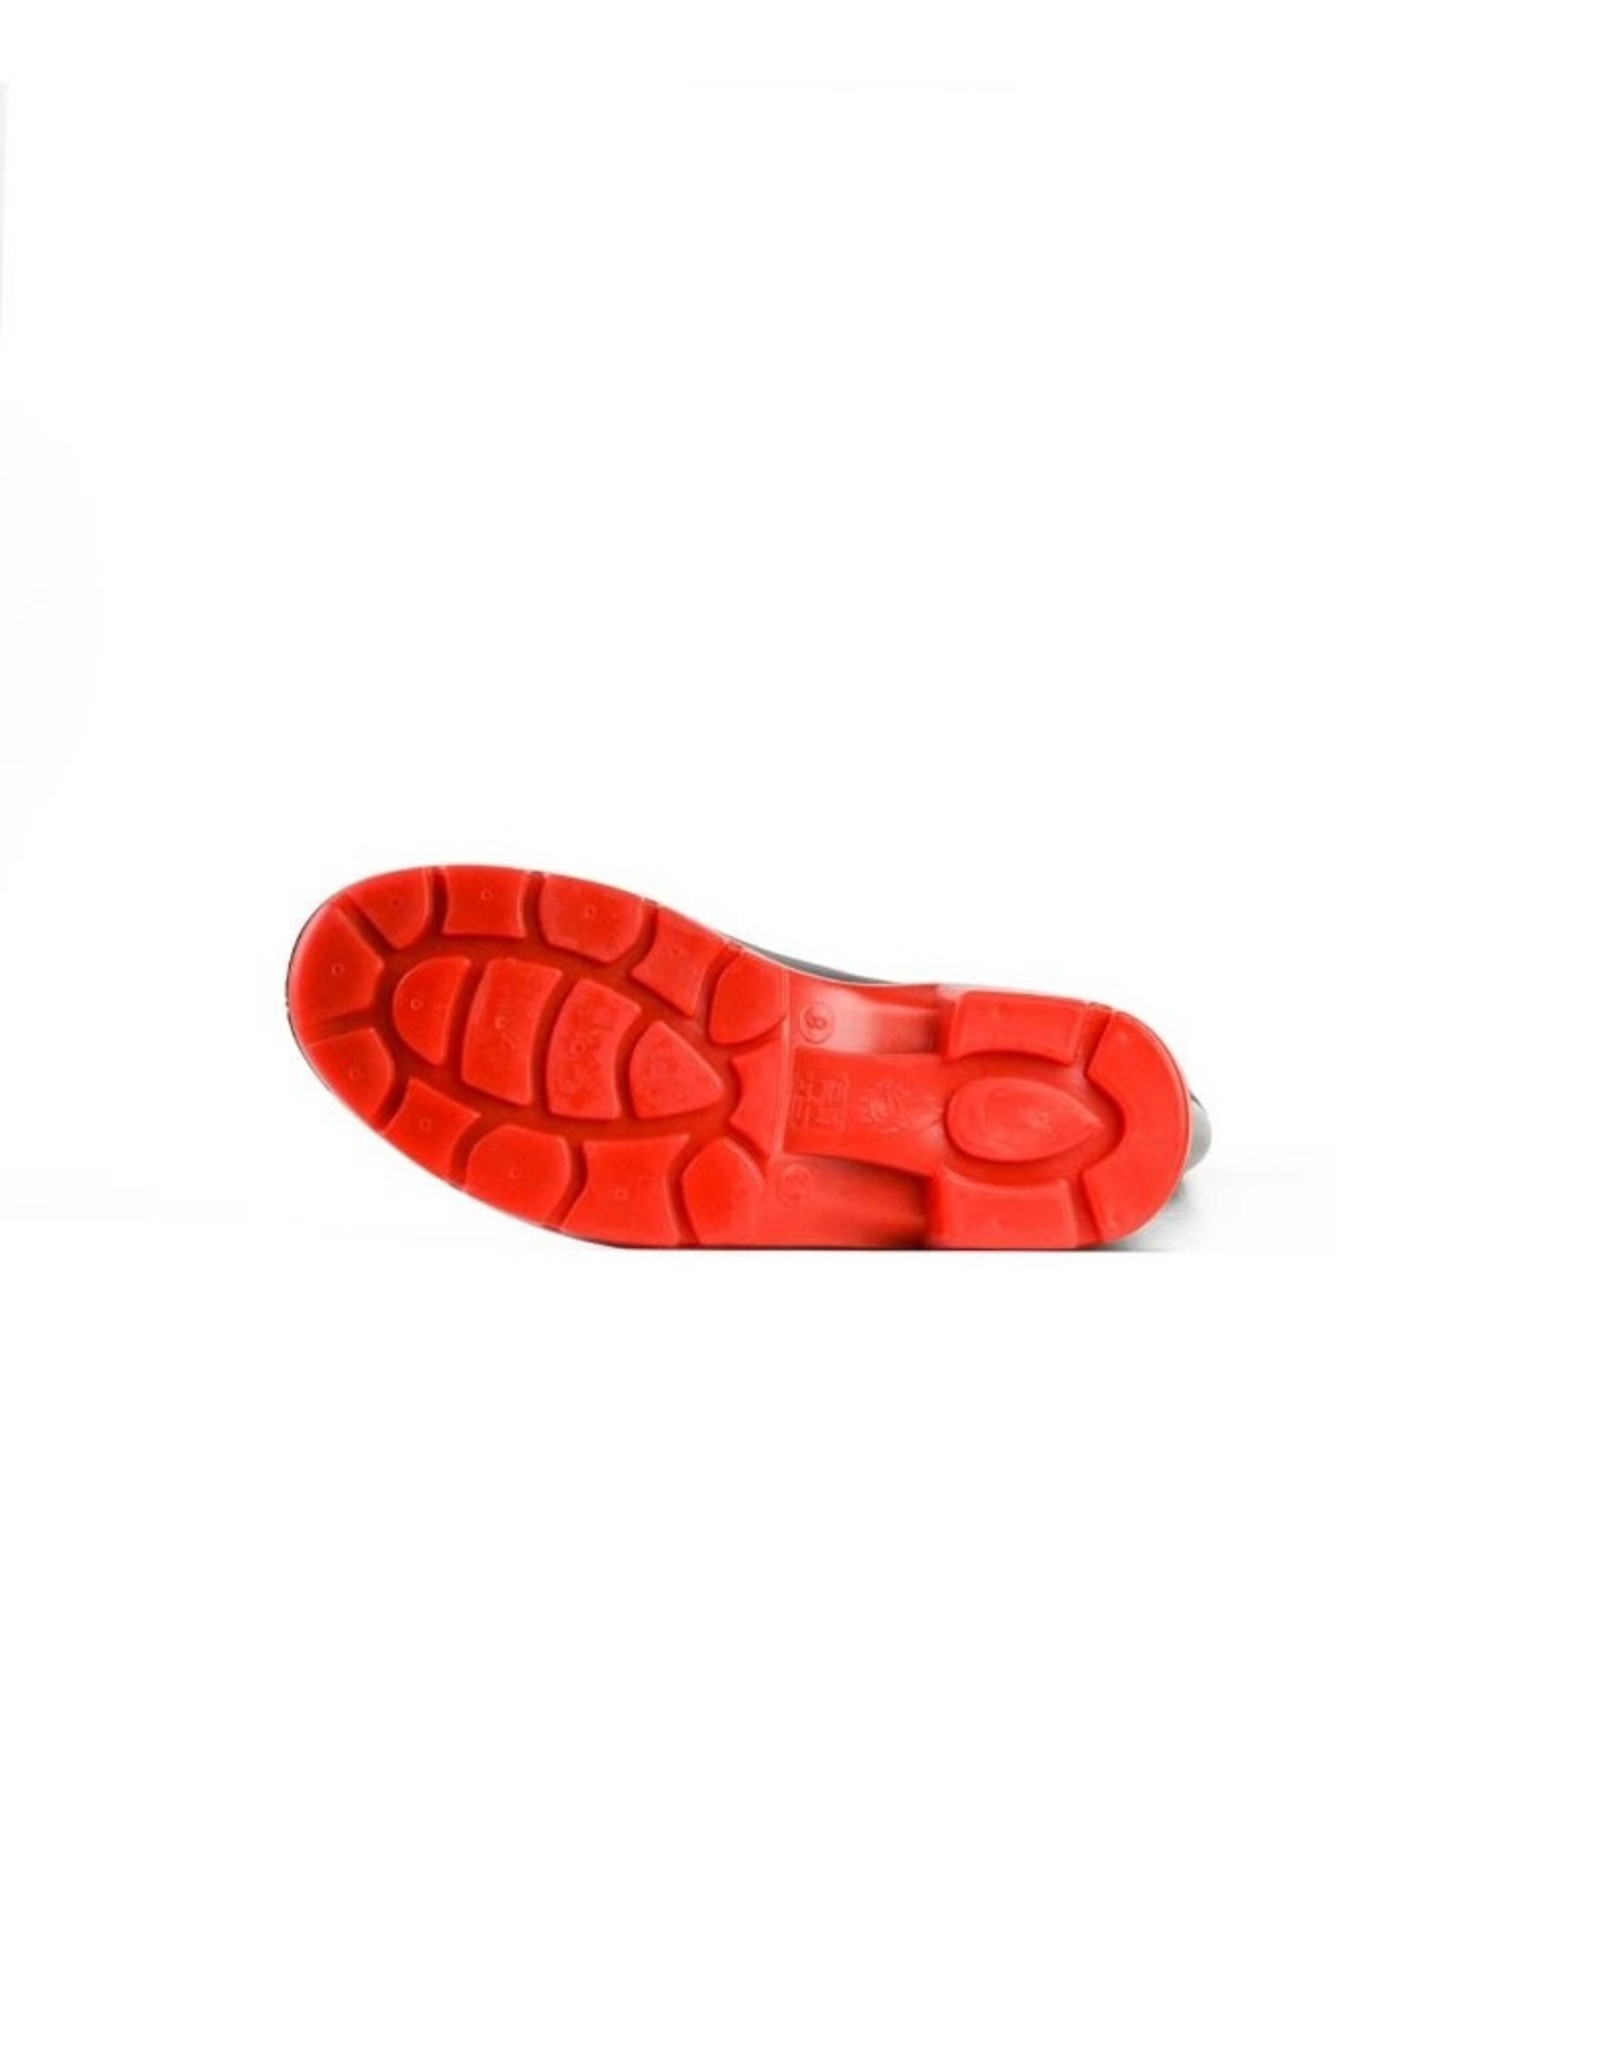 Bata Bata Utility Safety Toe Gumboots